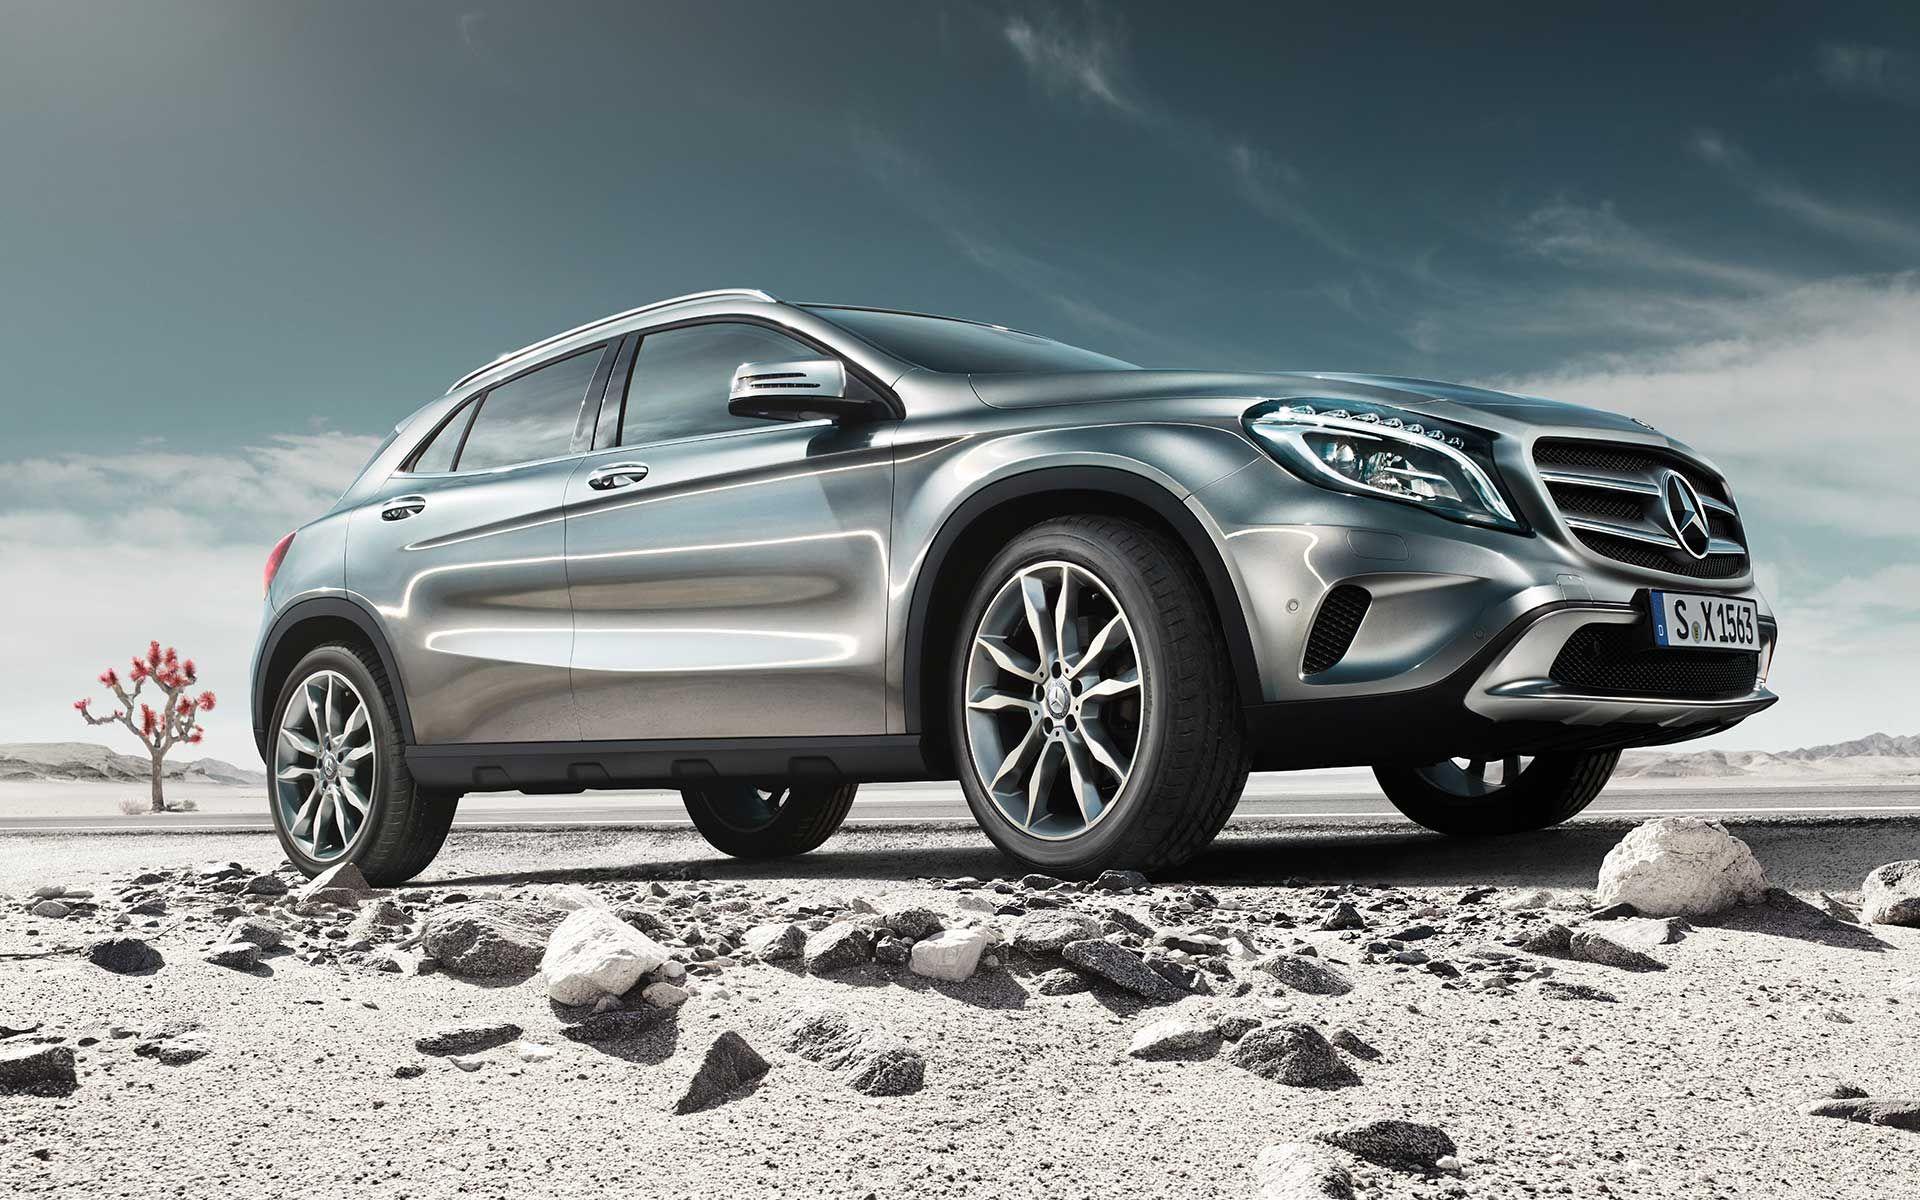 GLA mercedes benz! very nice suv | cars | Pinterest ...